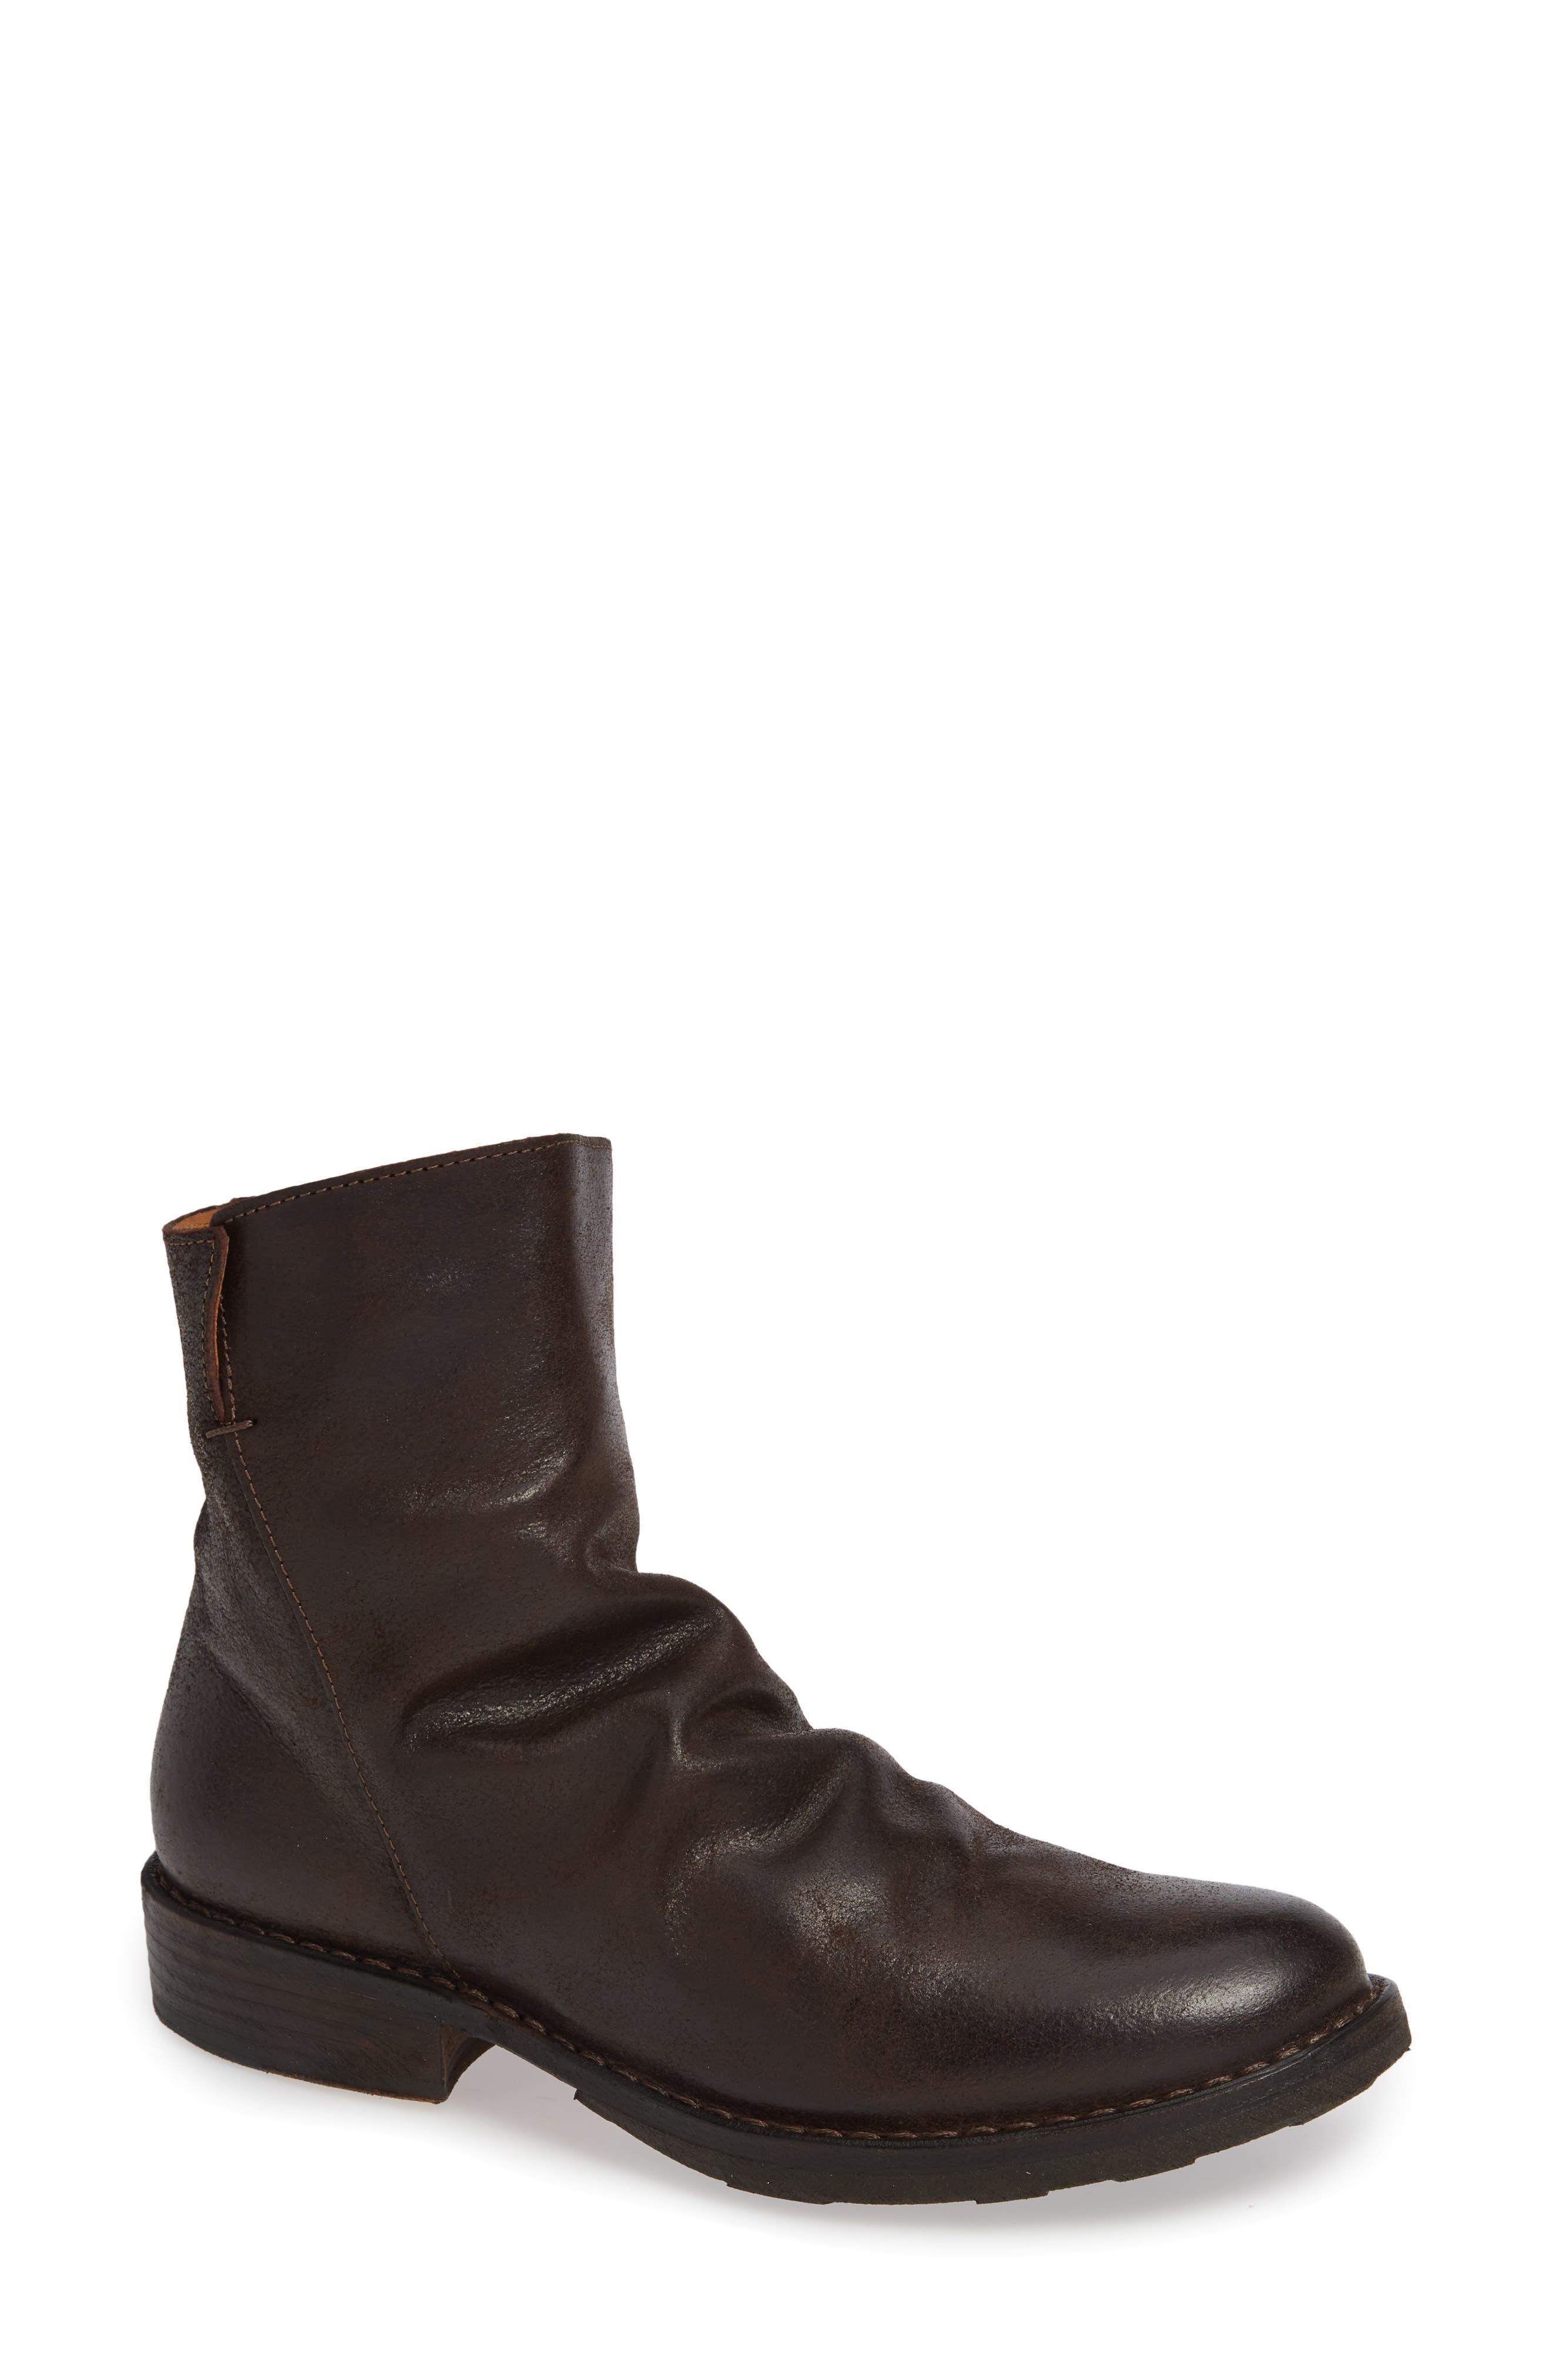 FIORENTINI + BAKER 'Elf' Boot in Coffee Leather